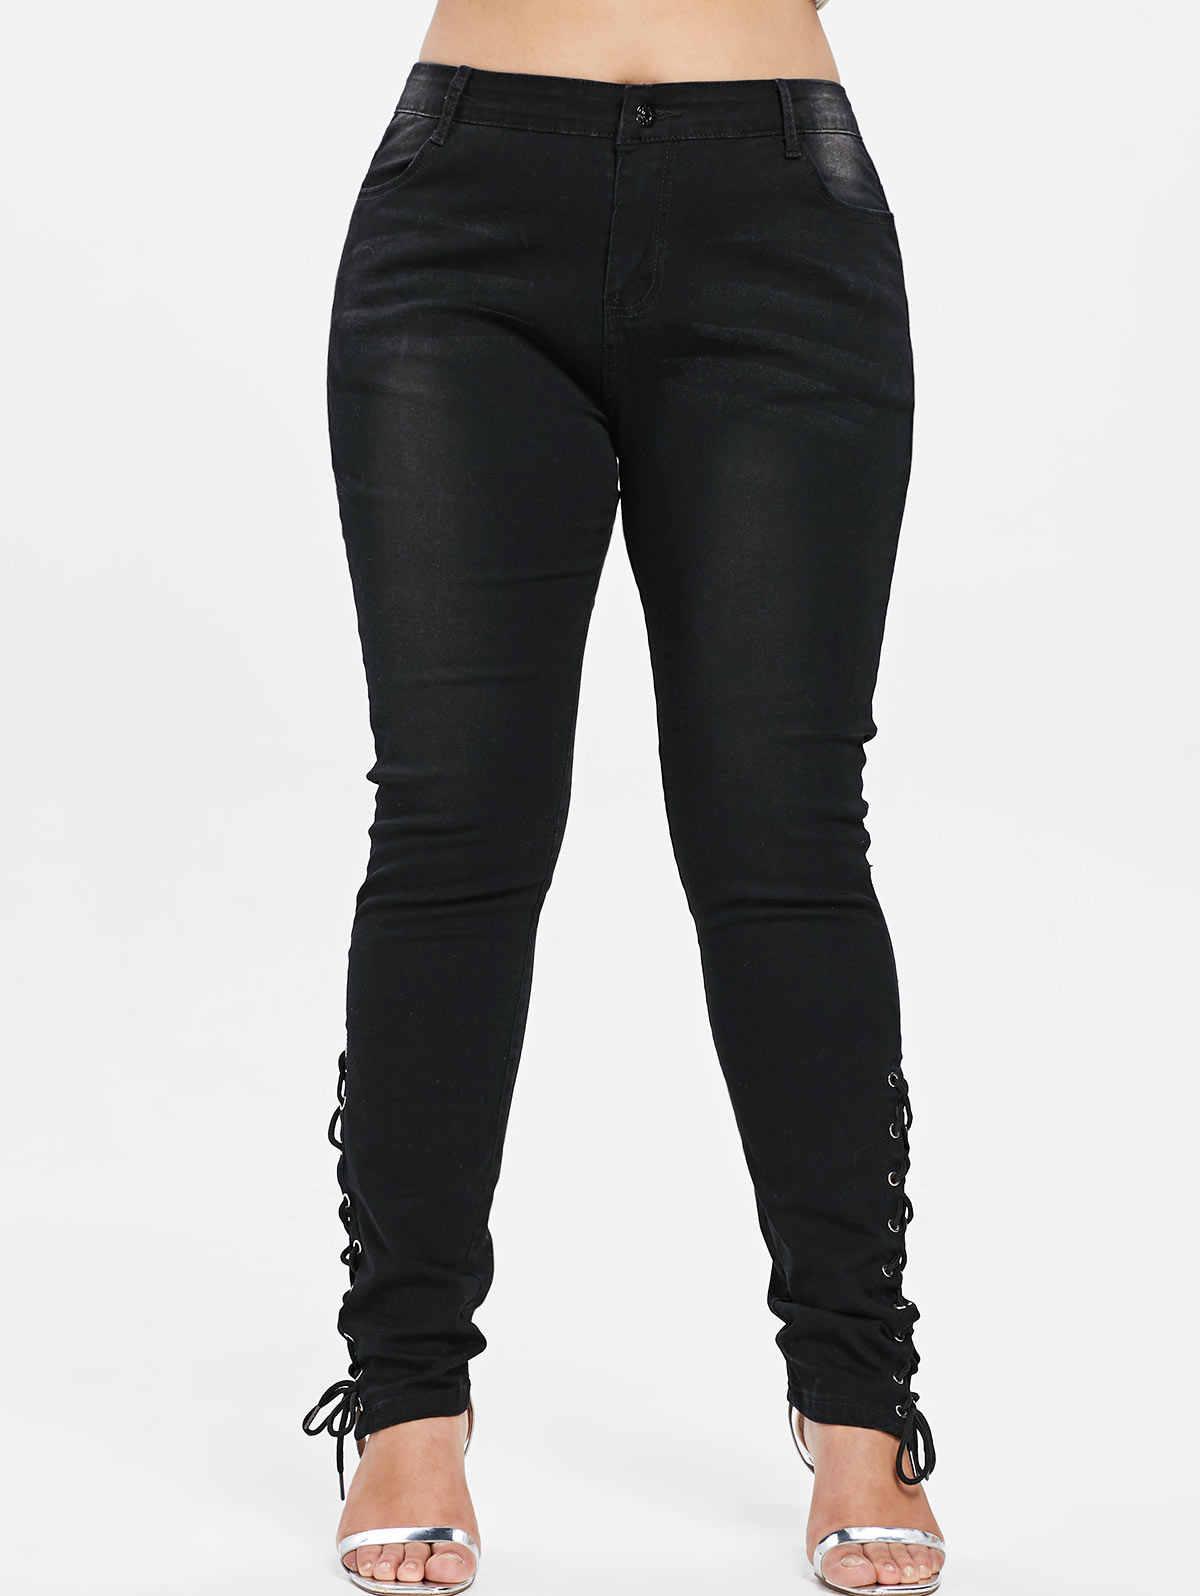 3f2ab00f8b7 ... Wipalo Plus Size Jeans Zipper Fly Side Lace Up Women Pants New Fashions  Skinny High Waist ...